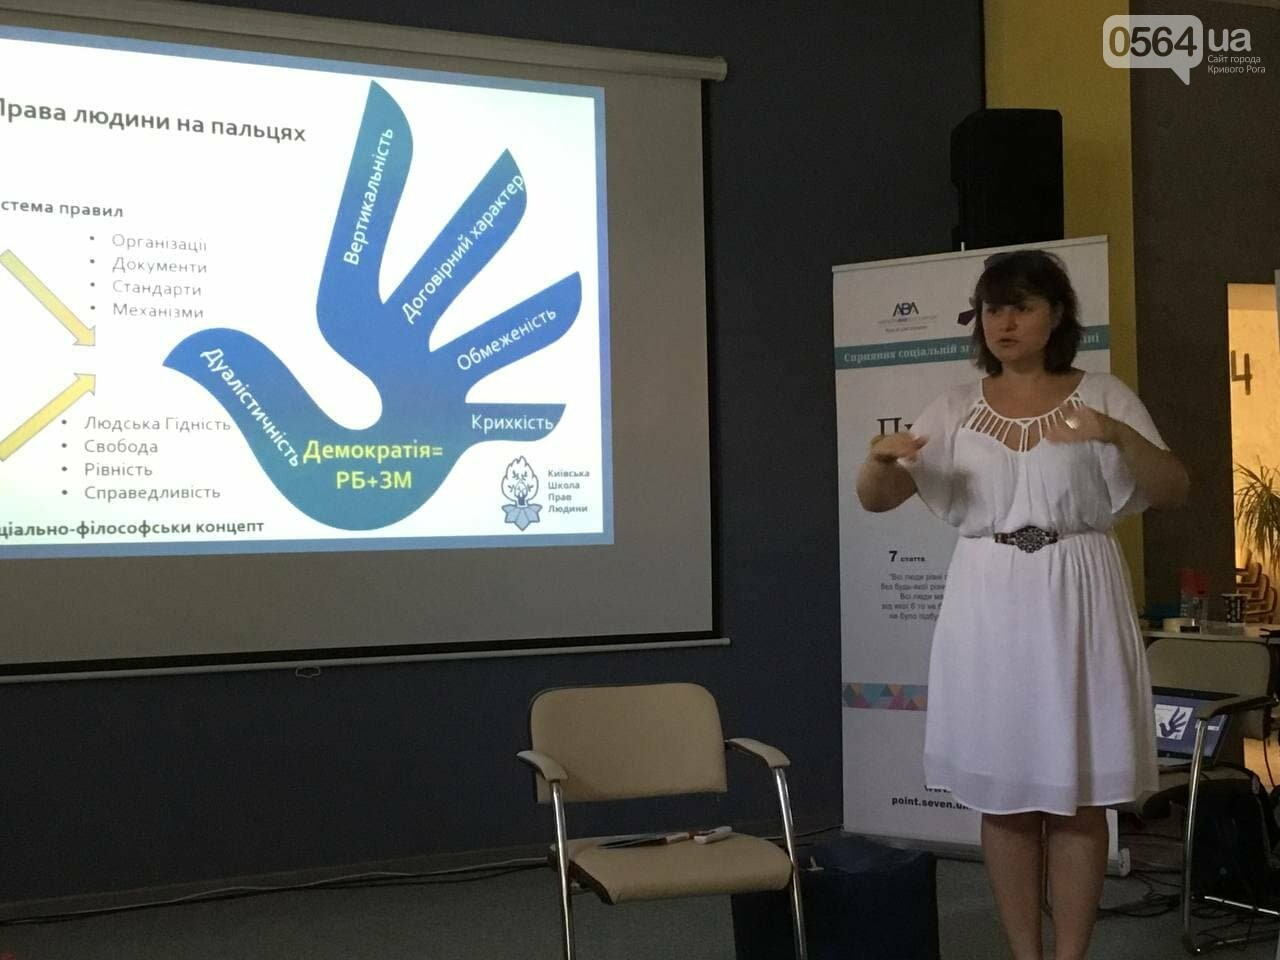 Криворожанам прочитали лекции о гендерном (не) равенстве и правах человека, - ФОТО, ВИДЕО, фото-16